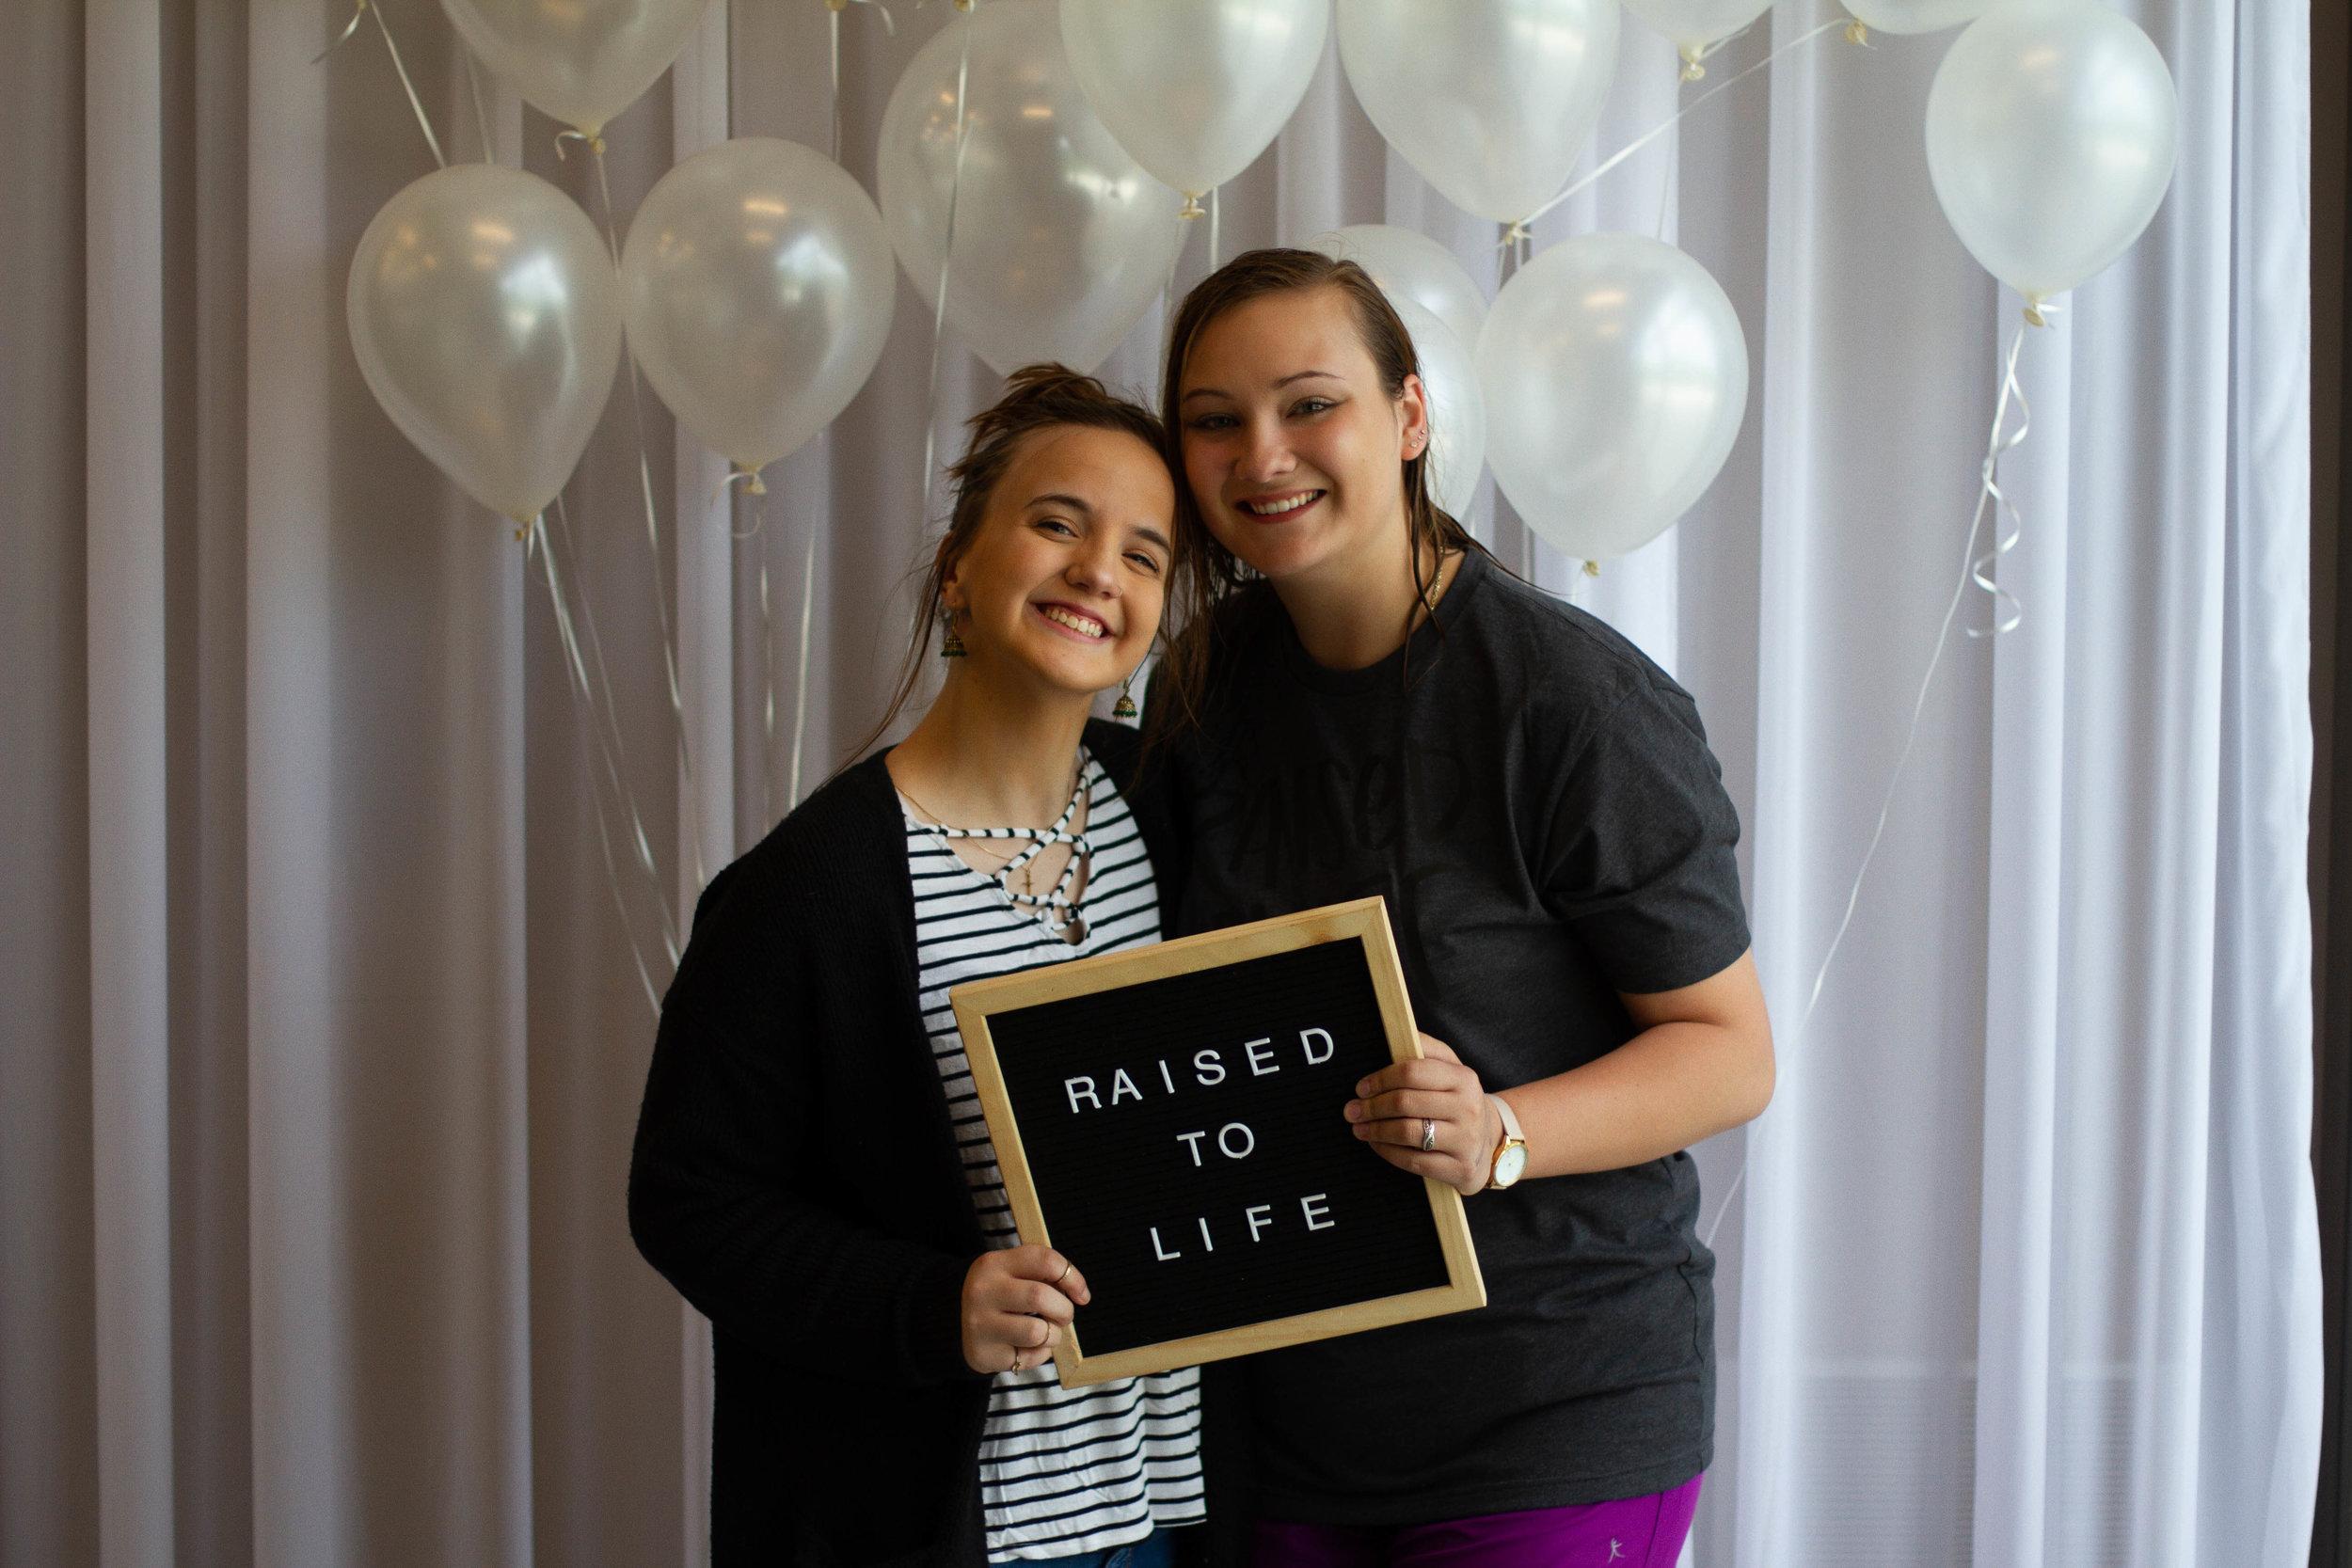 Raised to life Baptisms-14.jpg